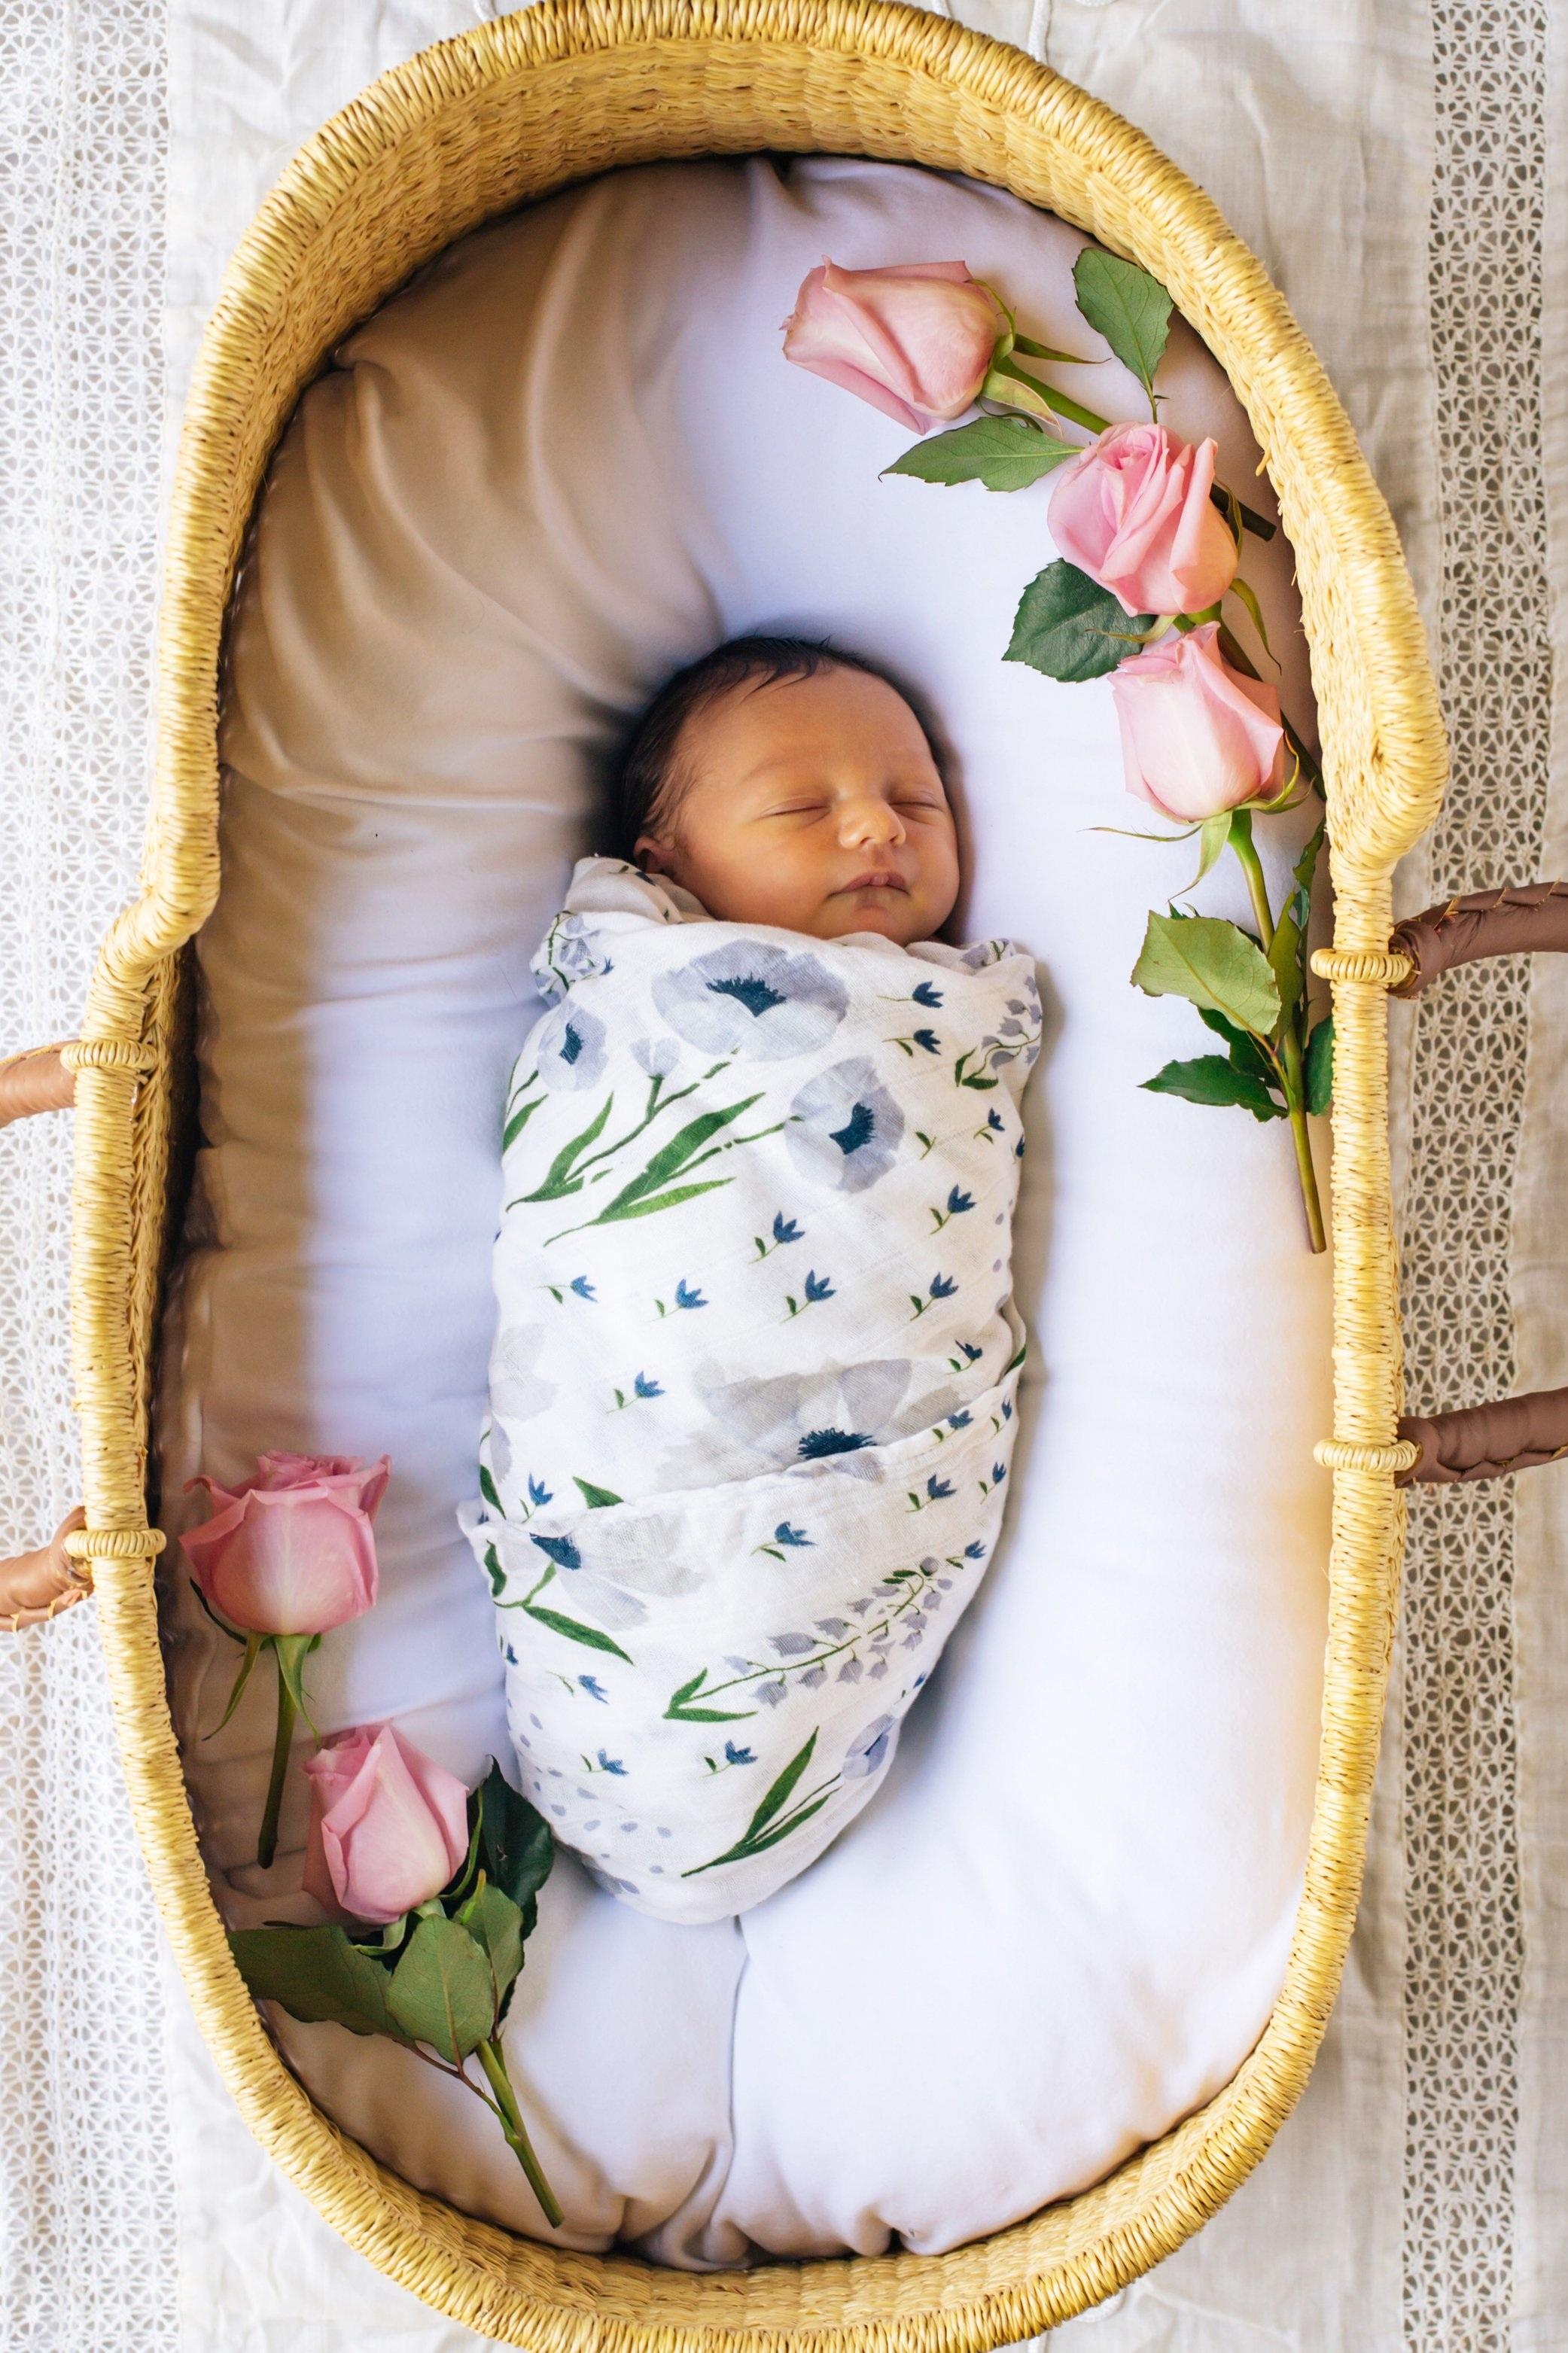 camila_newborn.jpg